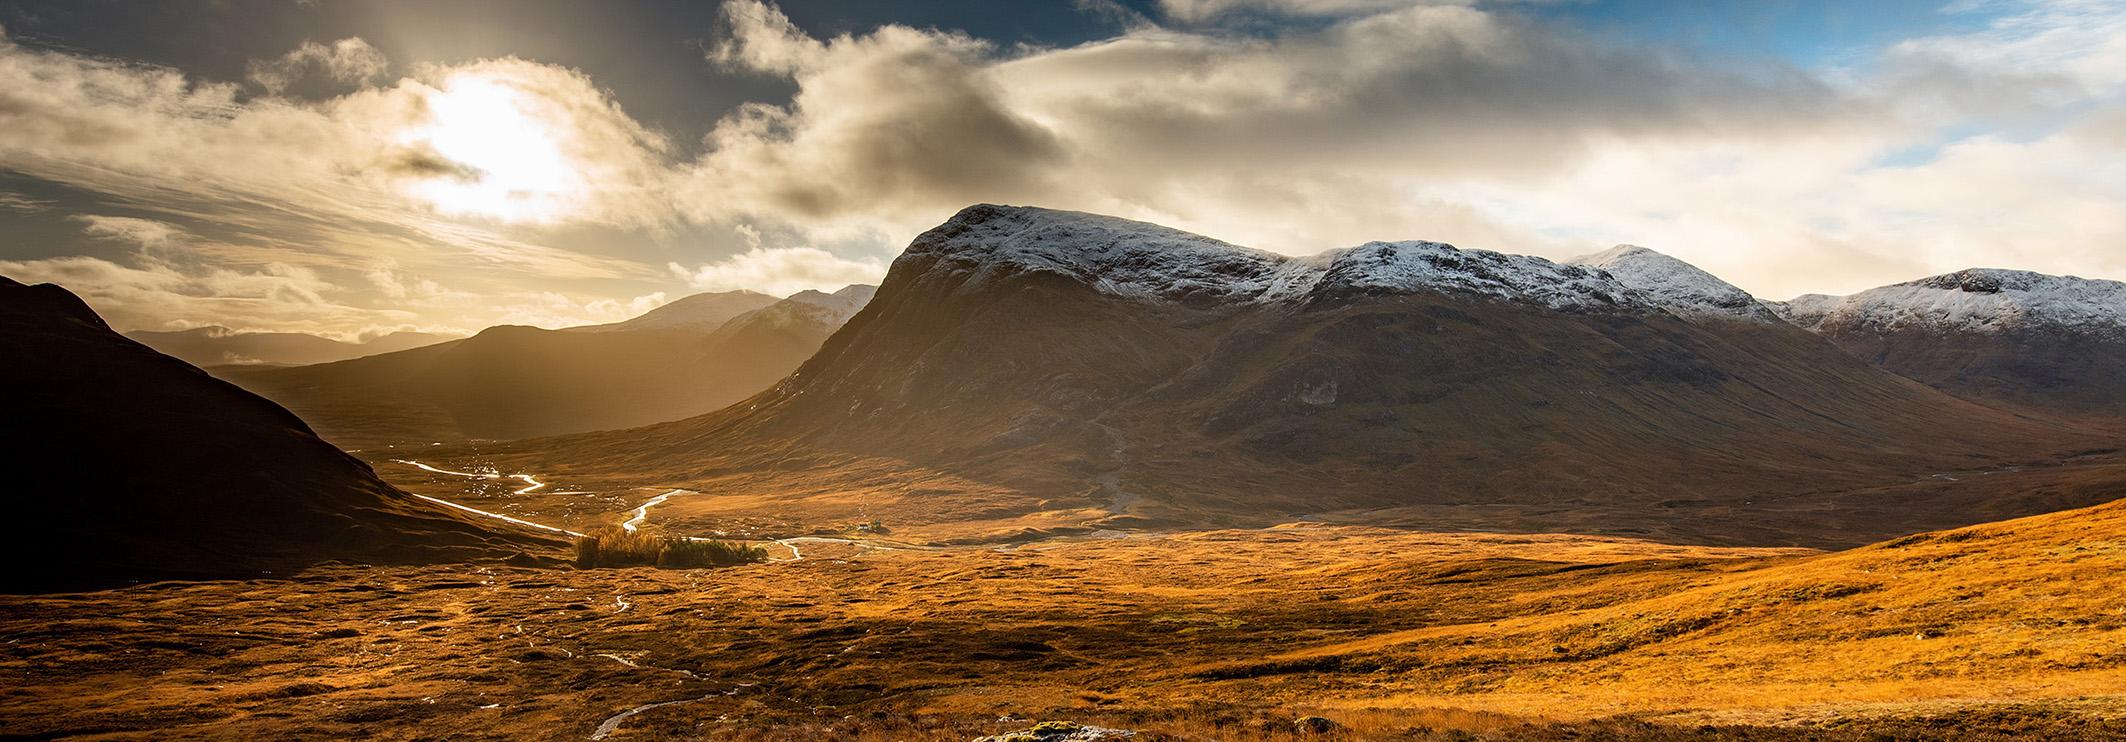 Glencoe Mountain Range